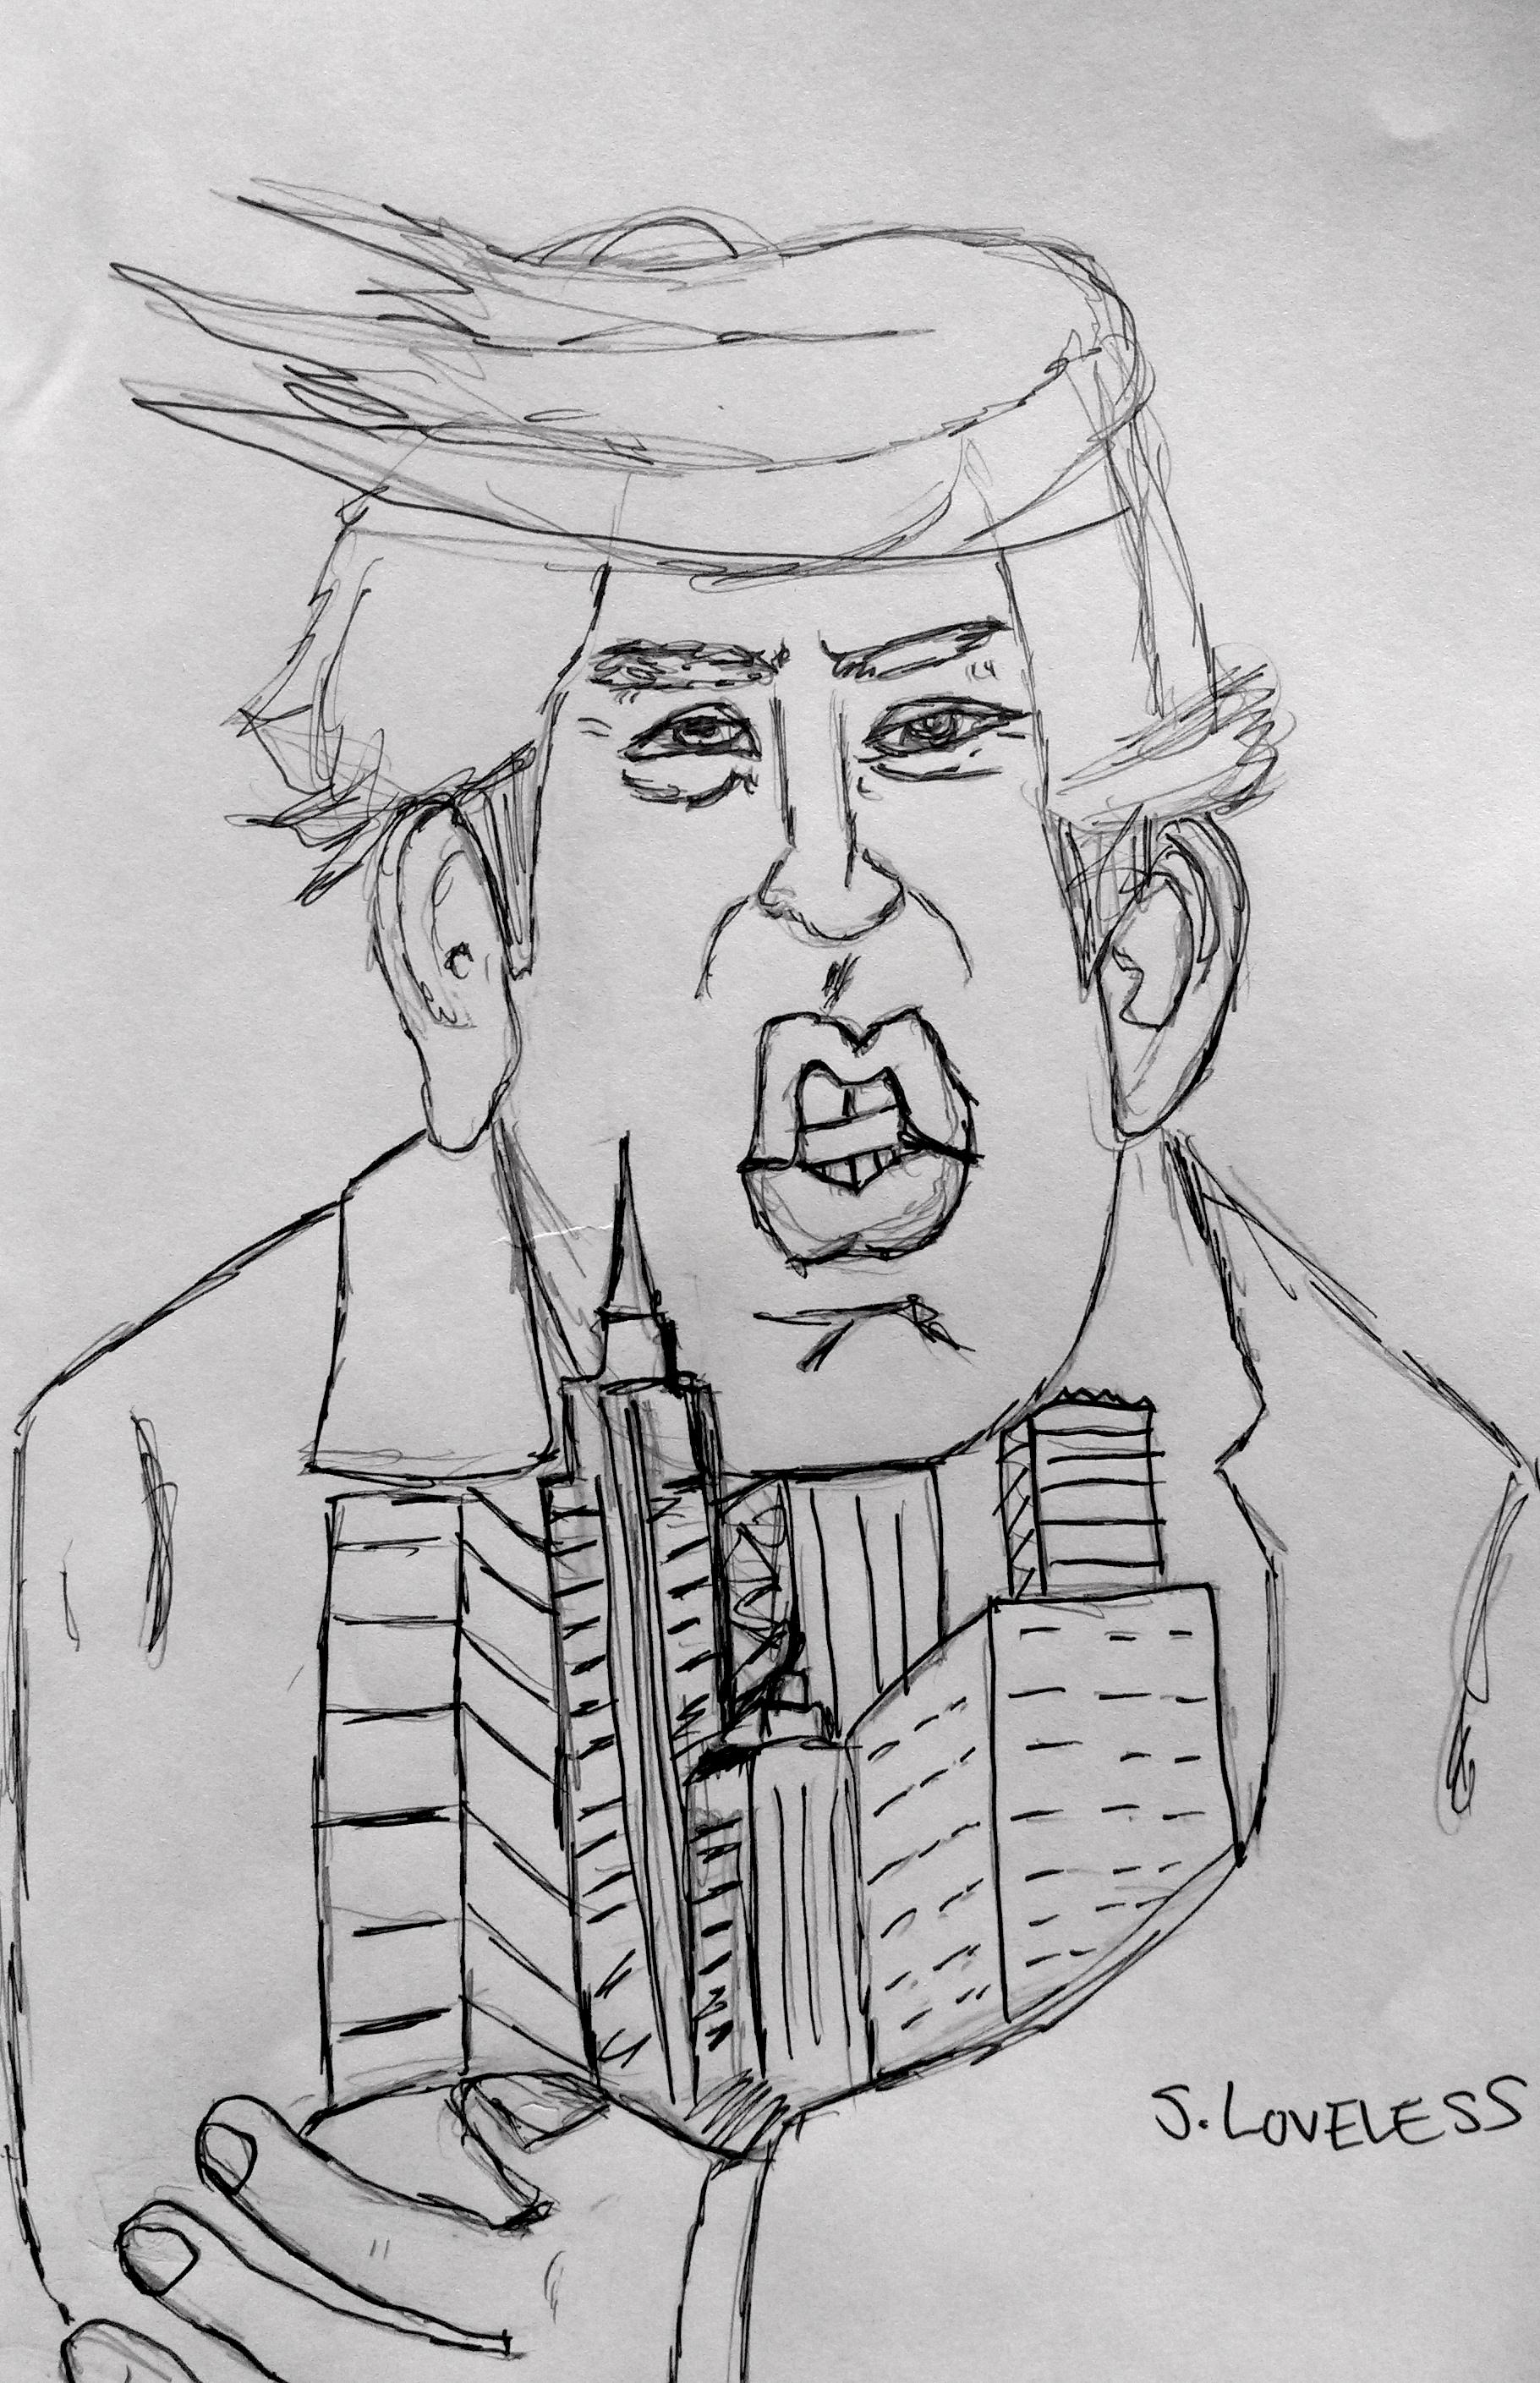 Donald Trump (source: S. Loveless)